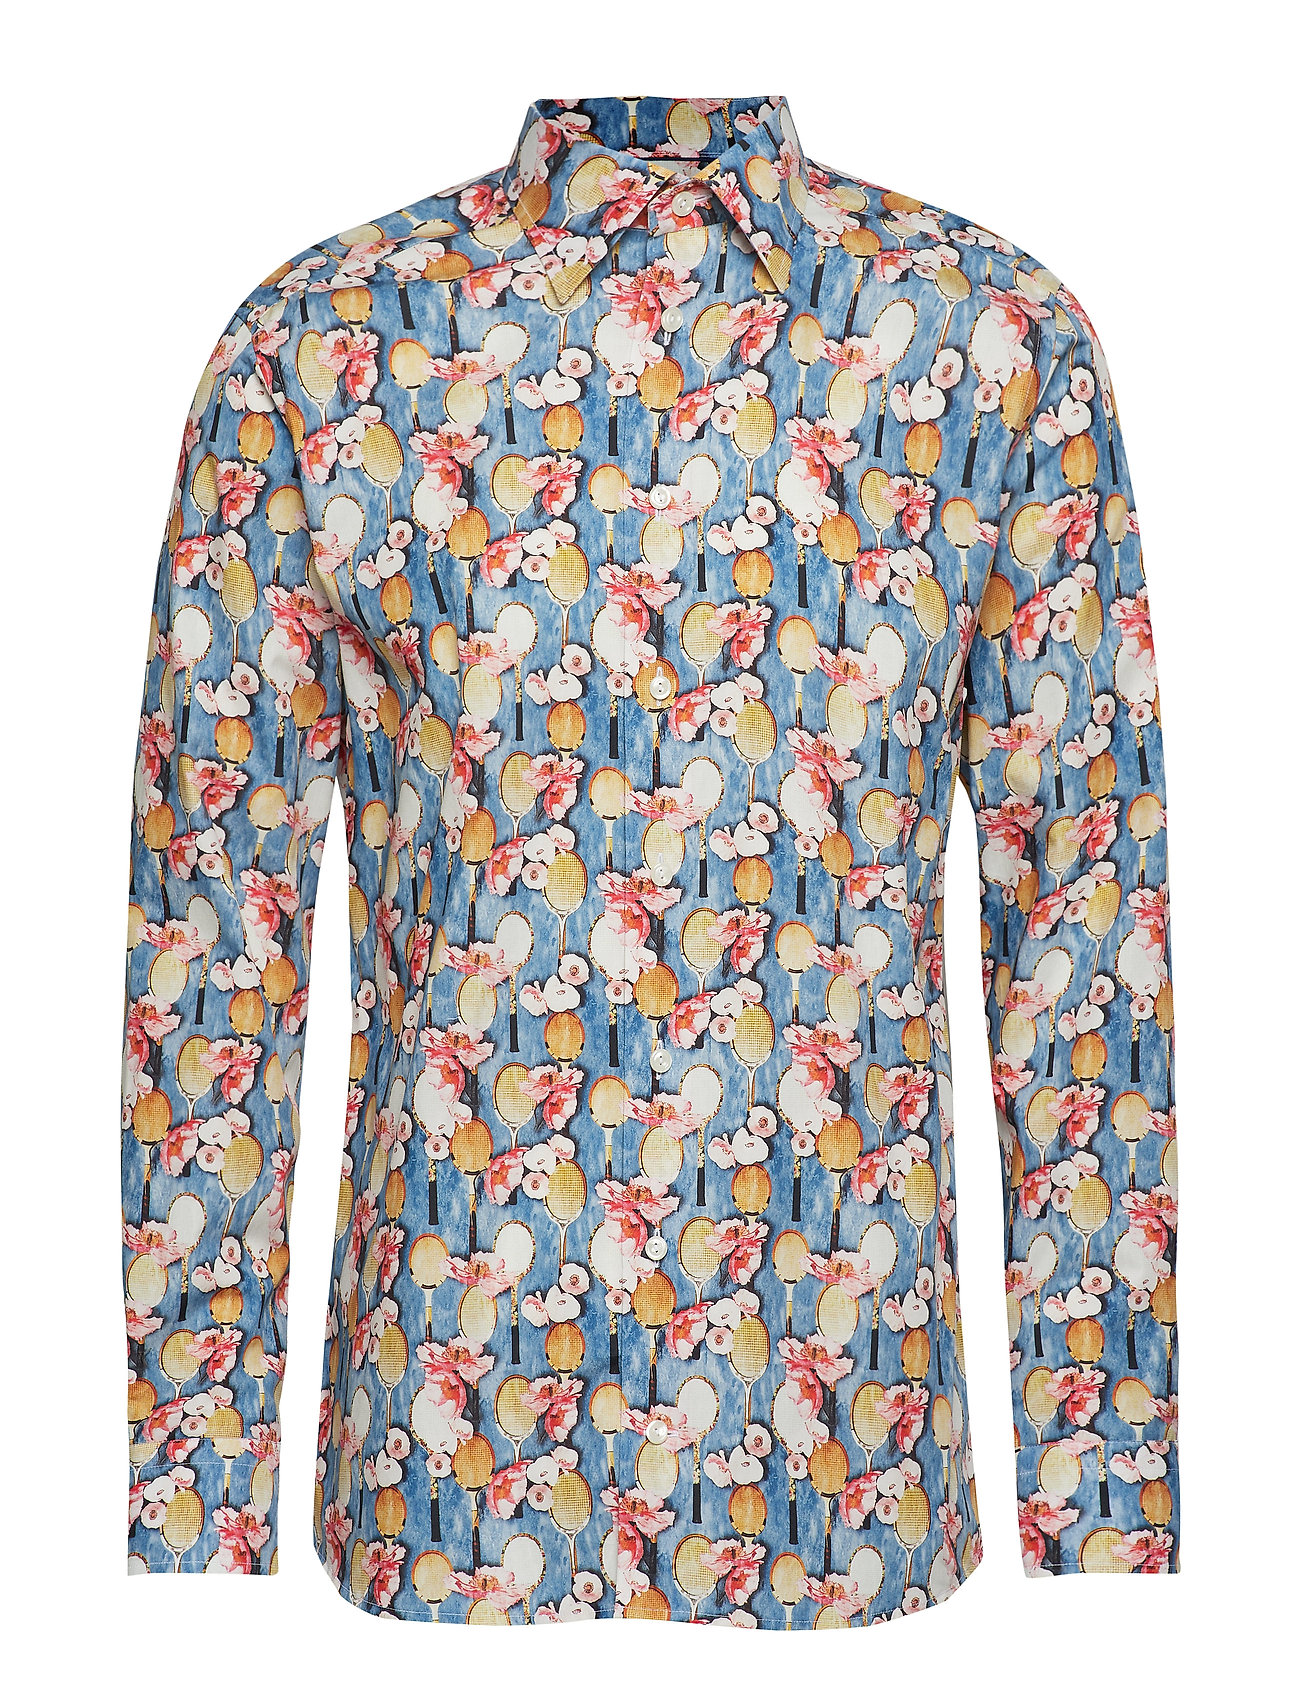 Eton Tennis Racket Flower Print Poplin Shirt - BLUE